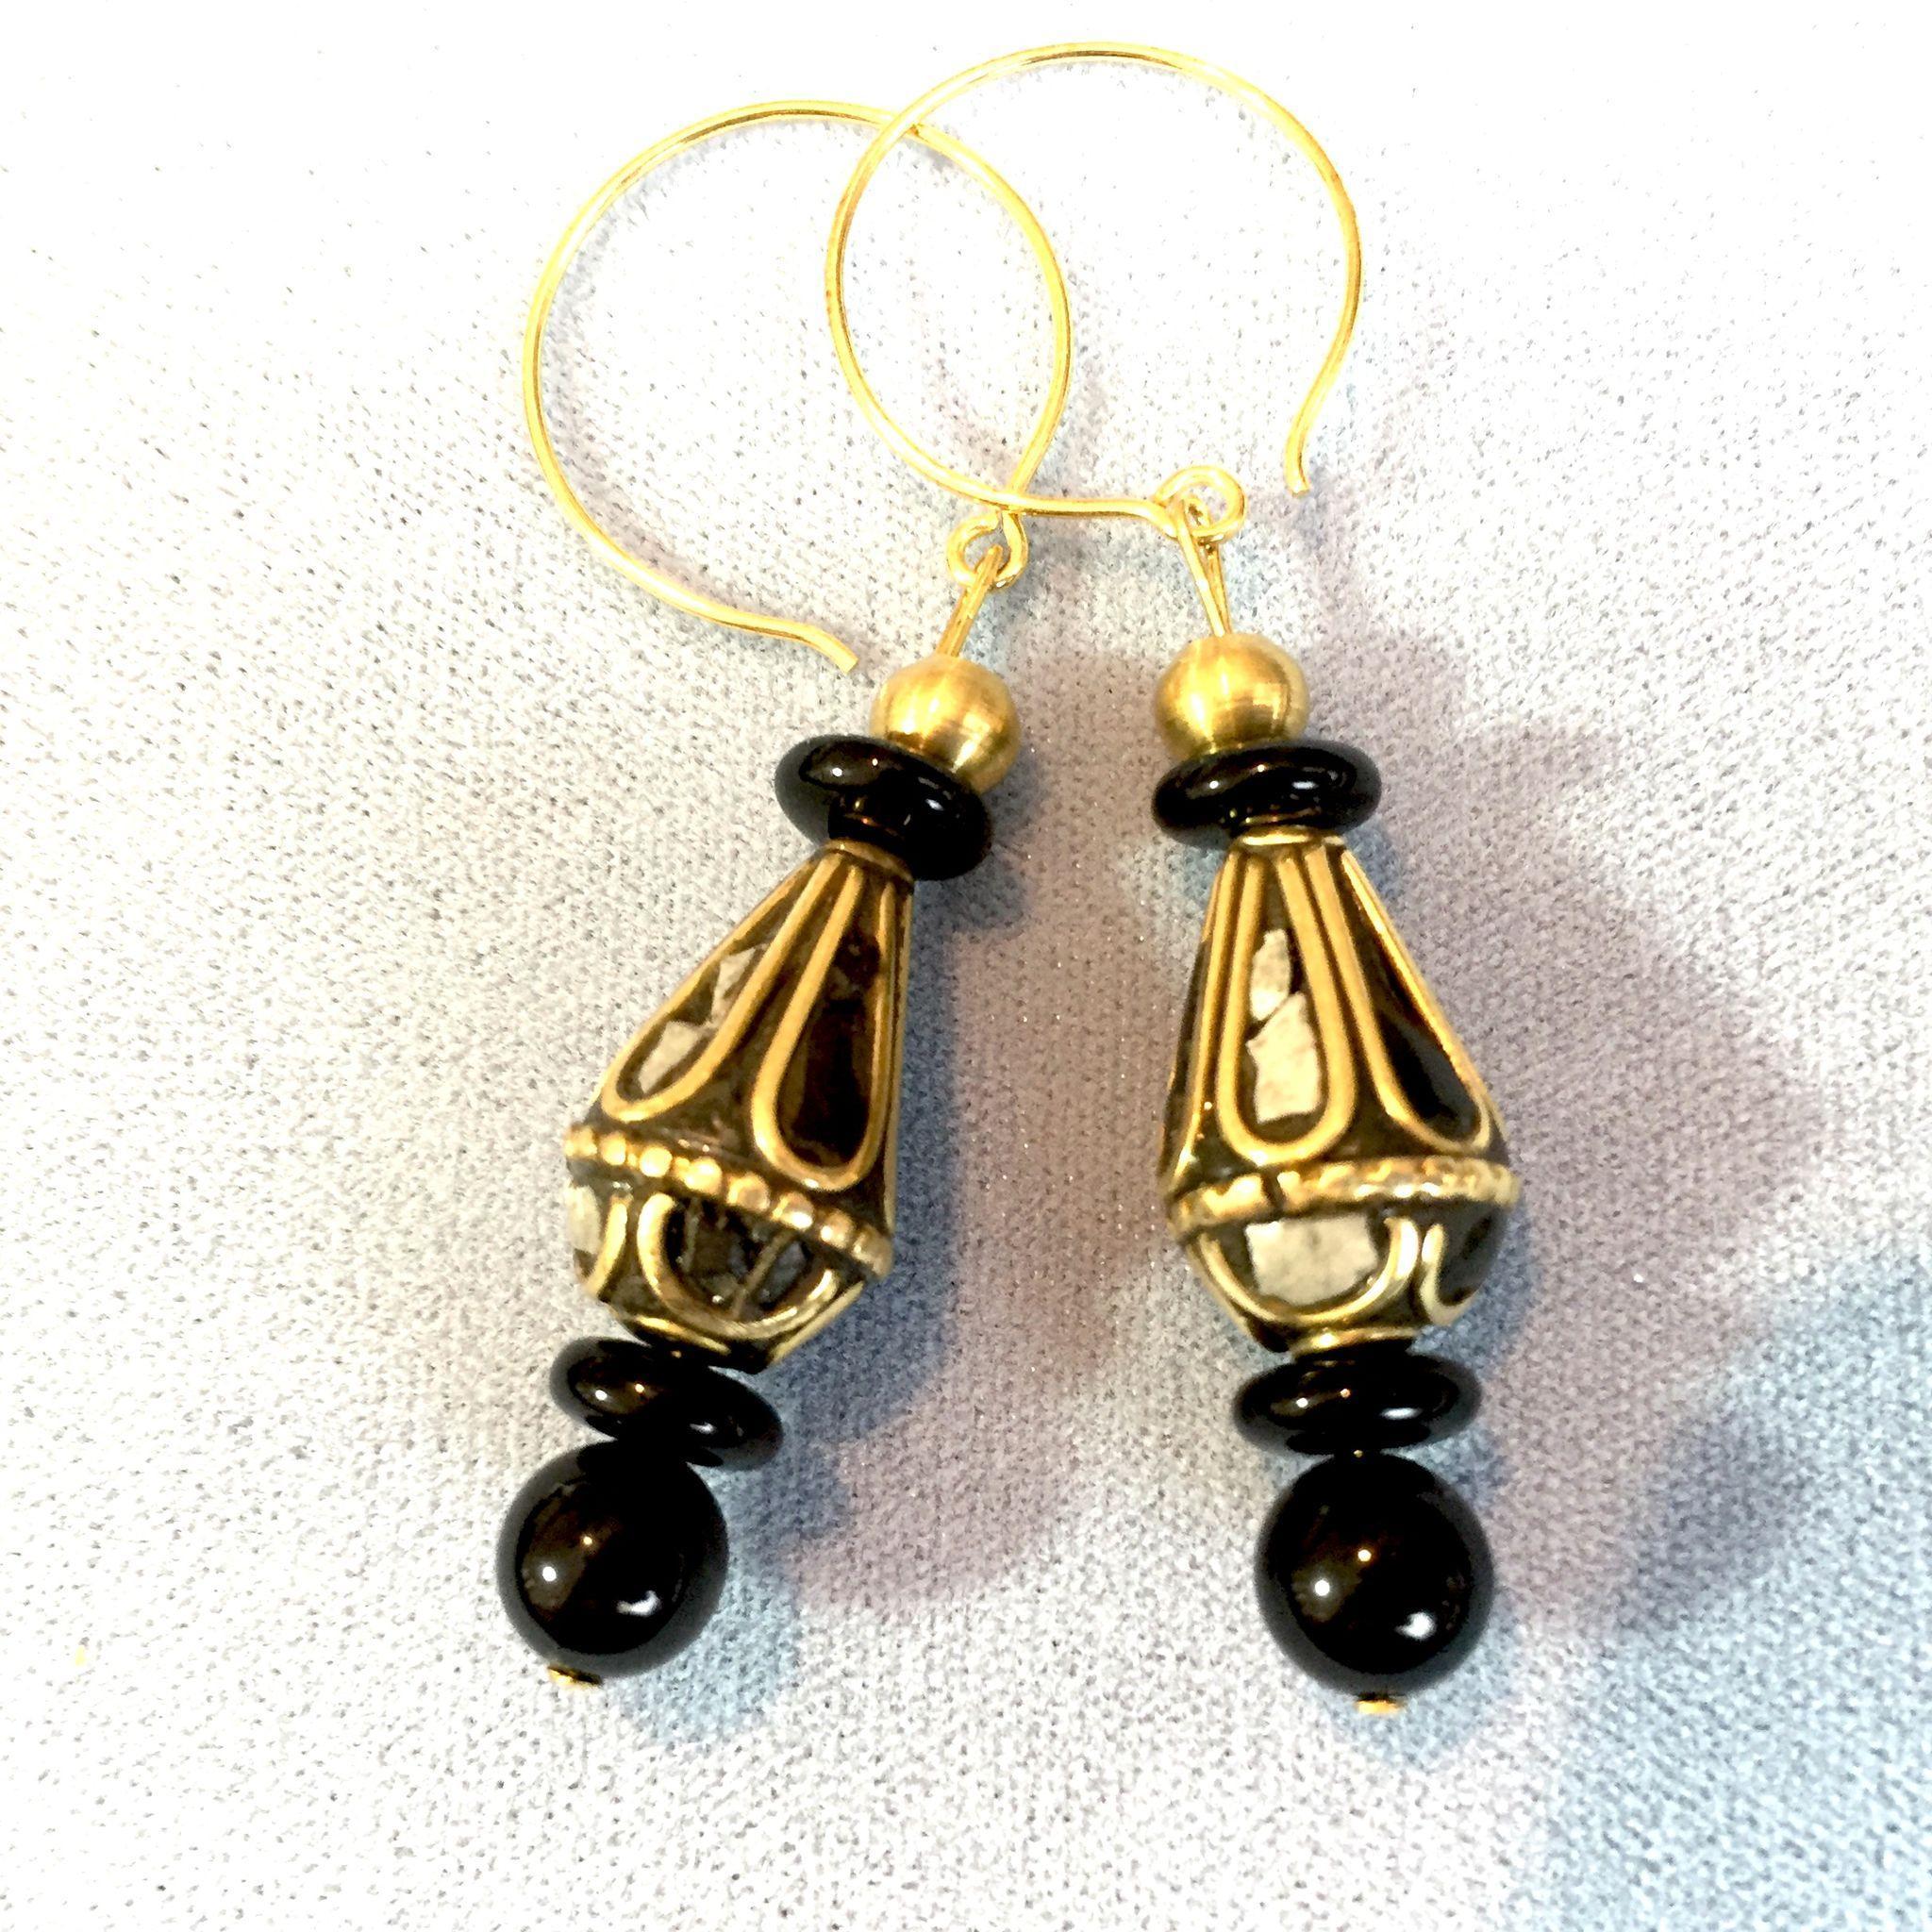 Brass, Black Onyx and Black & White Howlite Earrings #1, 2-1/2 Inches